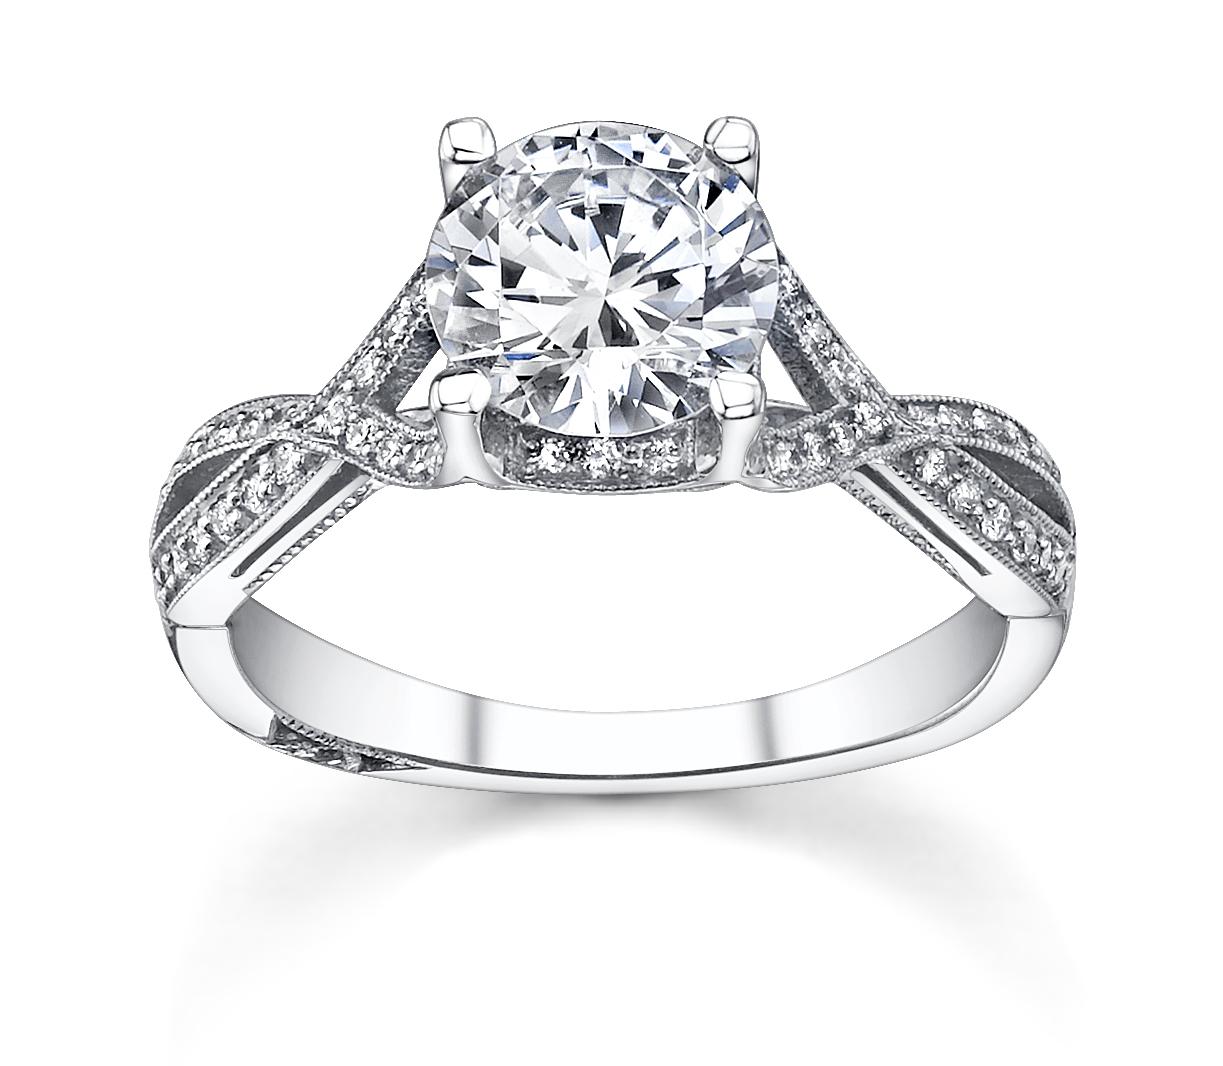 cheap wedding gowns online blog tacori engagement wedding rings. Black Bedroom Furniture Sets. Home Design Ideas